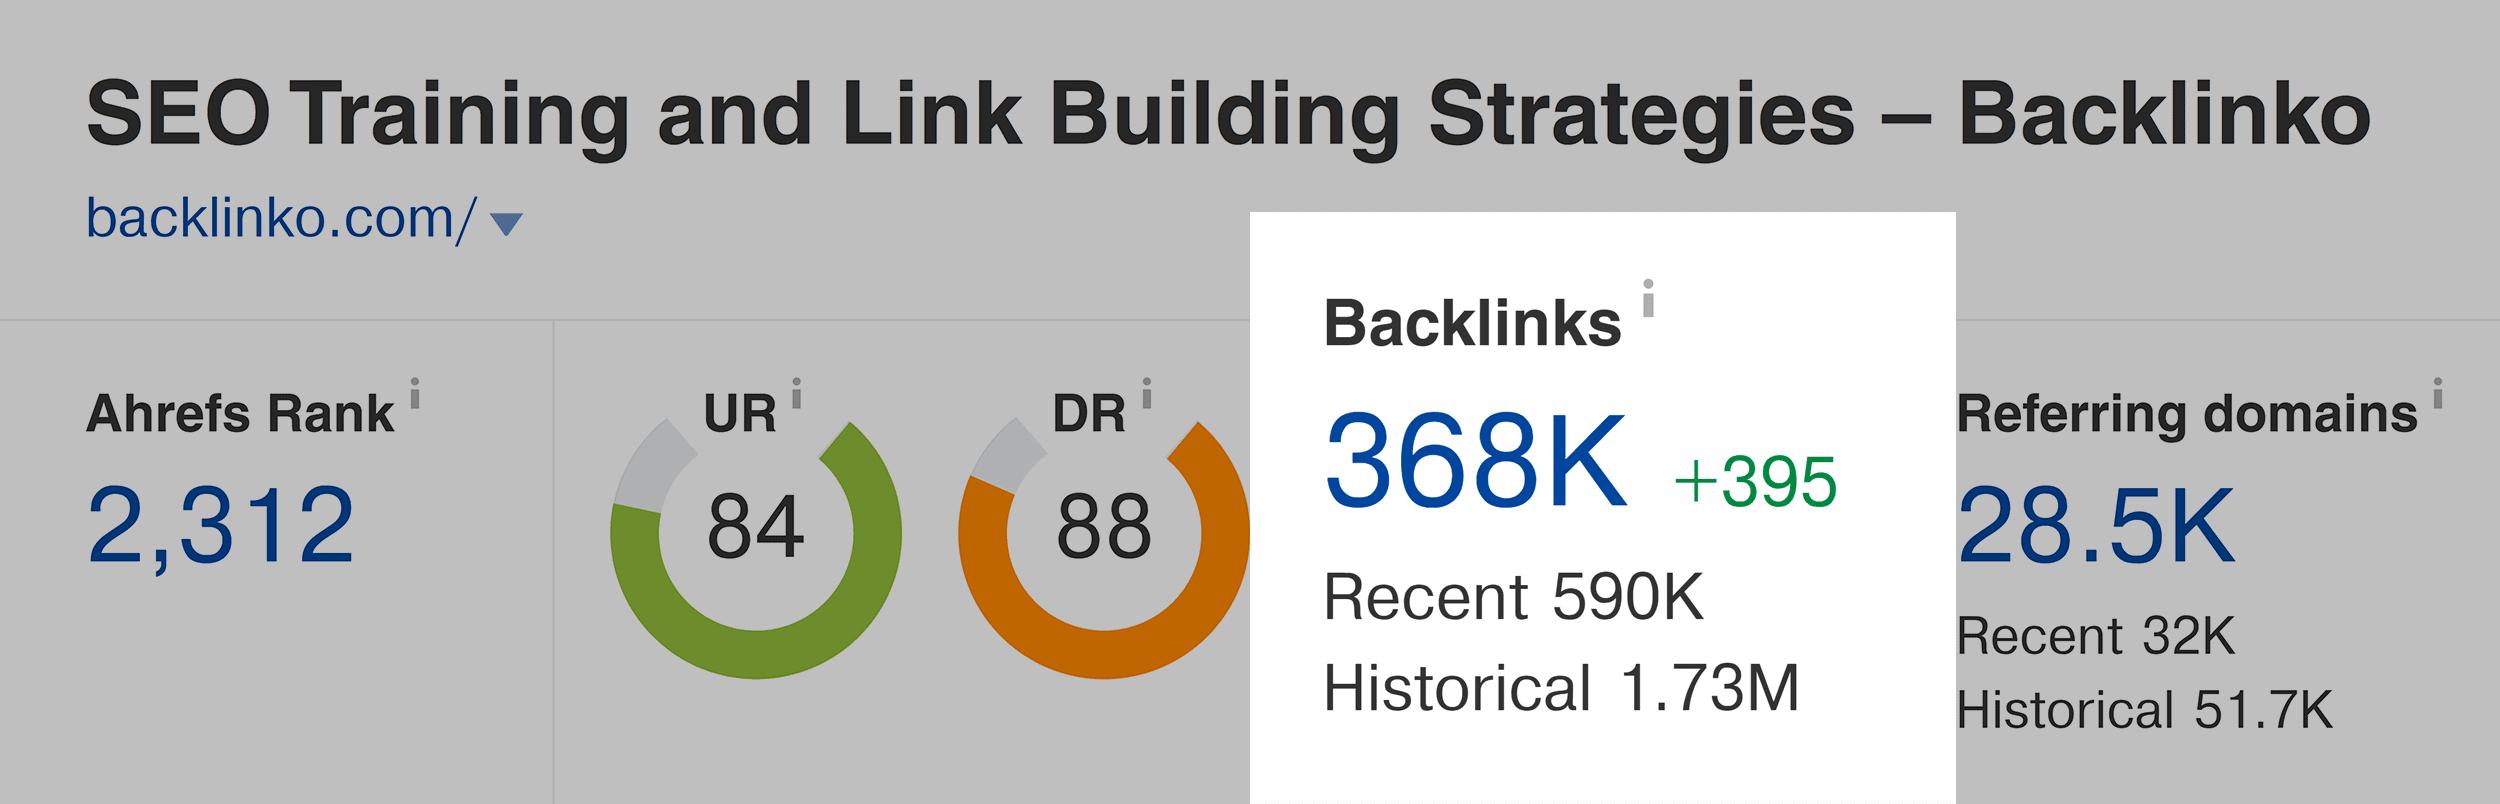 Ahrefs – Backlinko – Backlinks